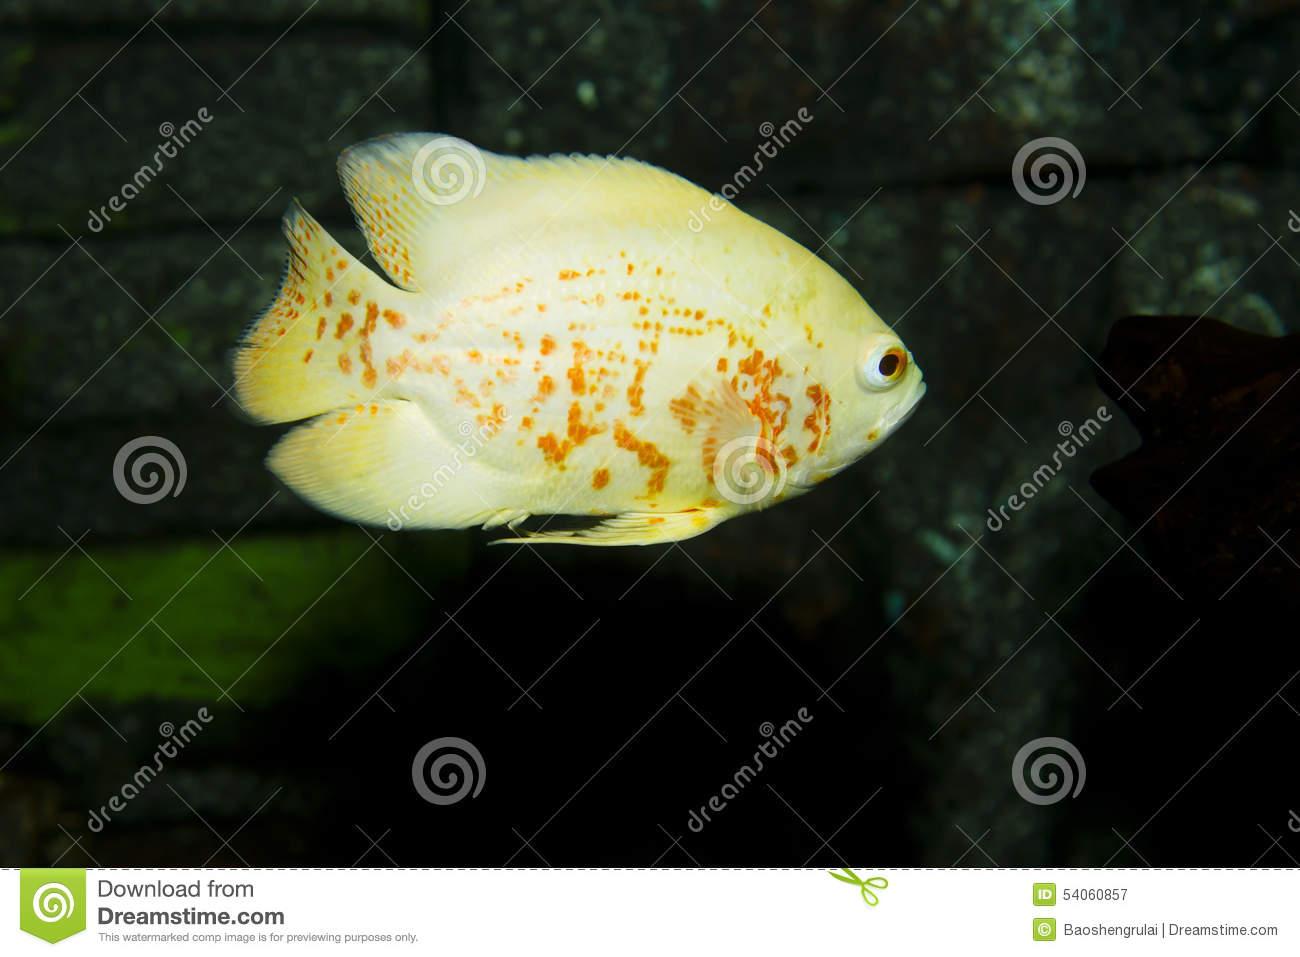 Oscar (Fish) clipart #6, Download drawings